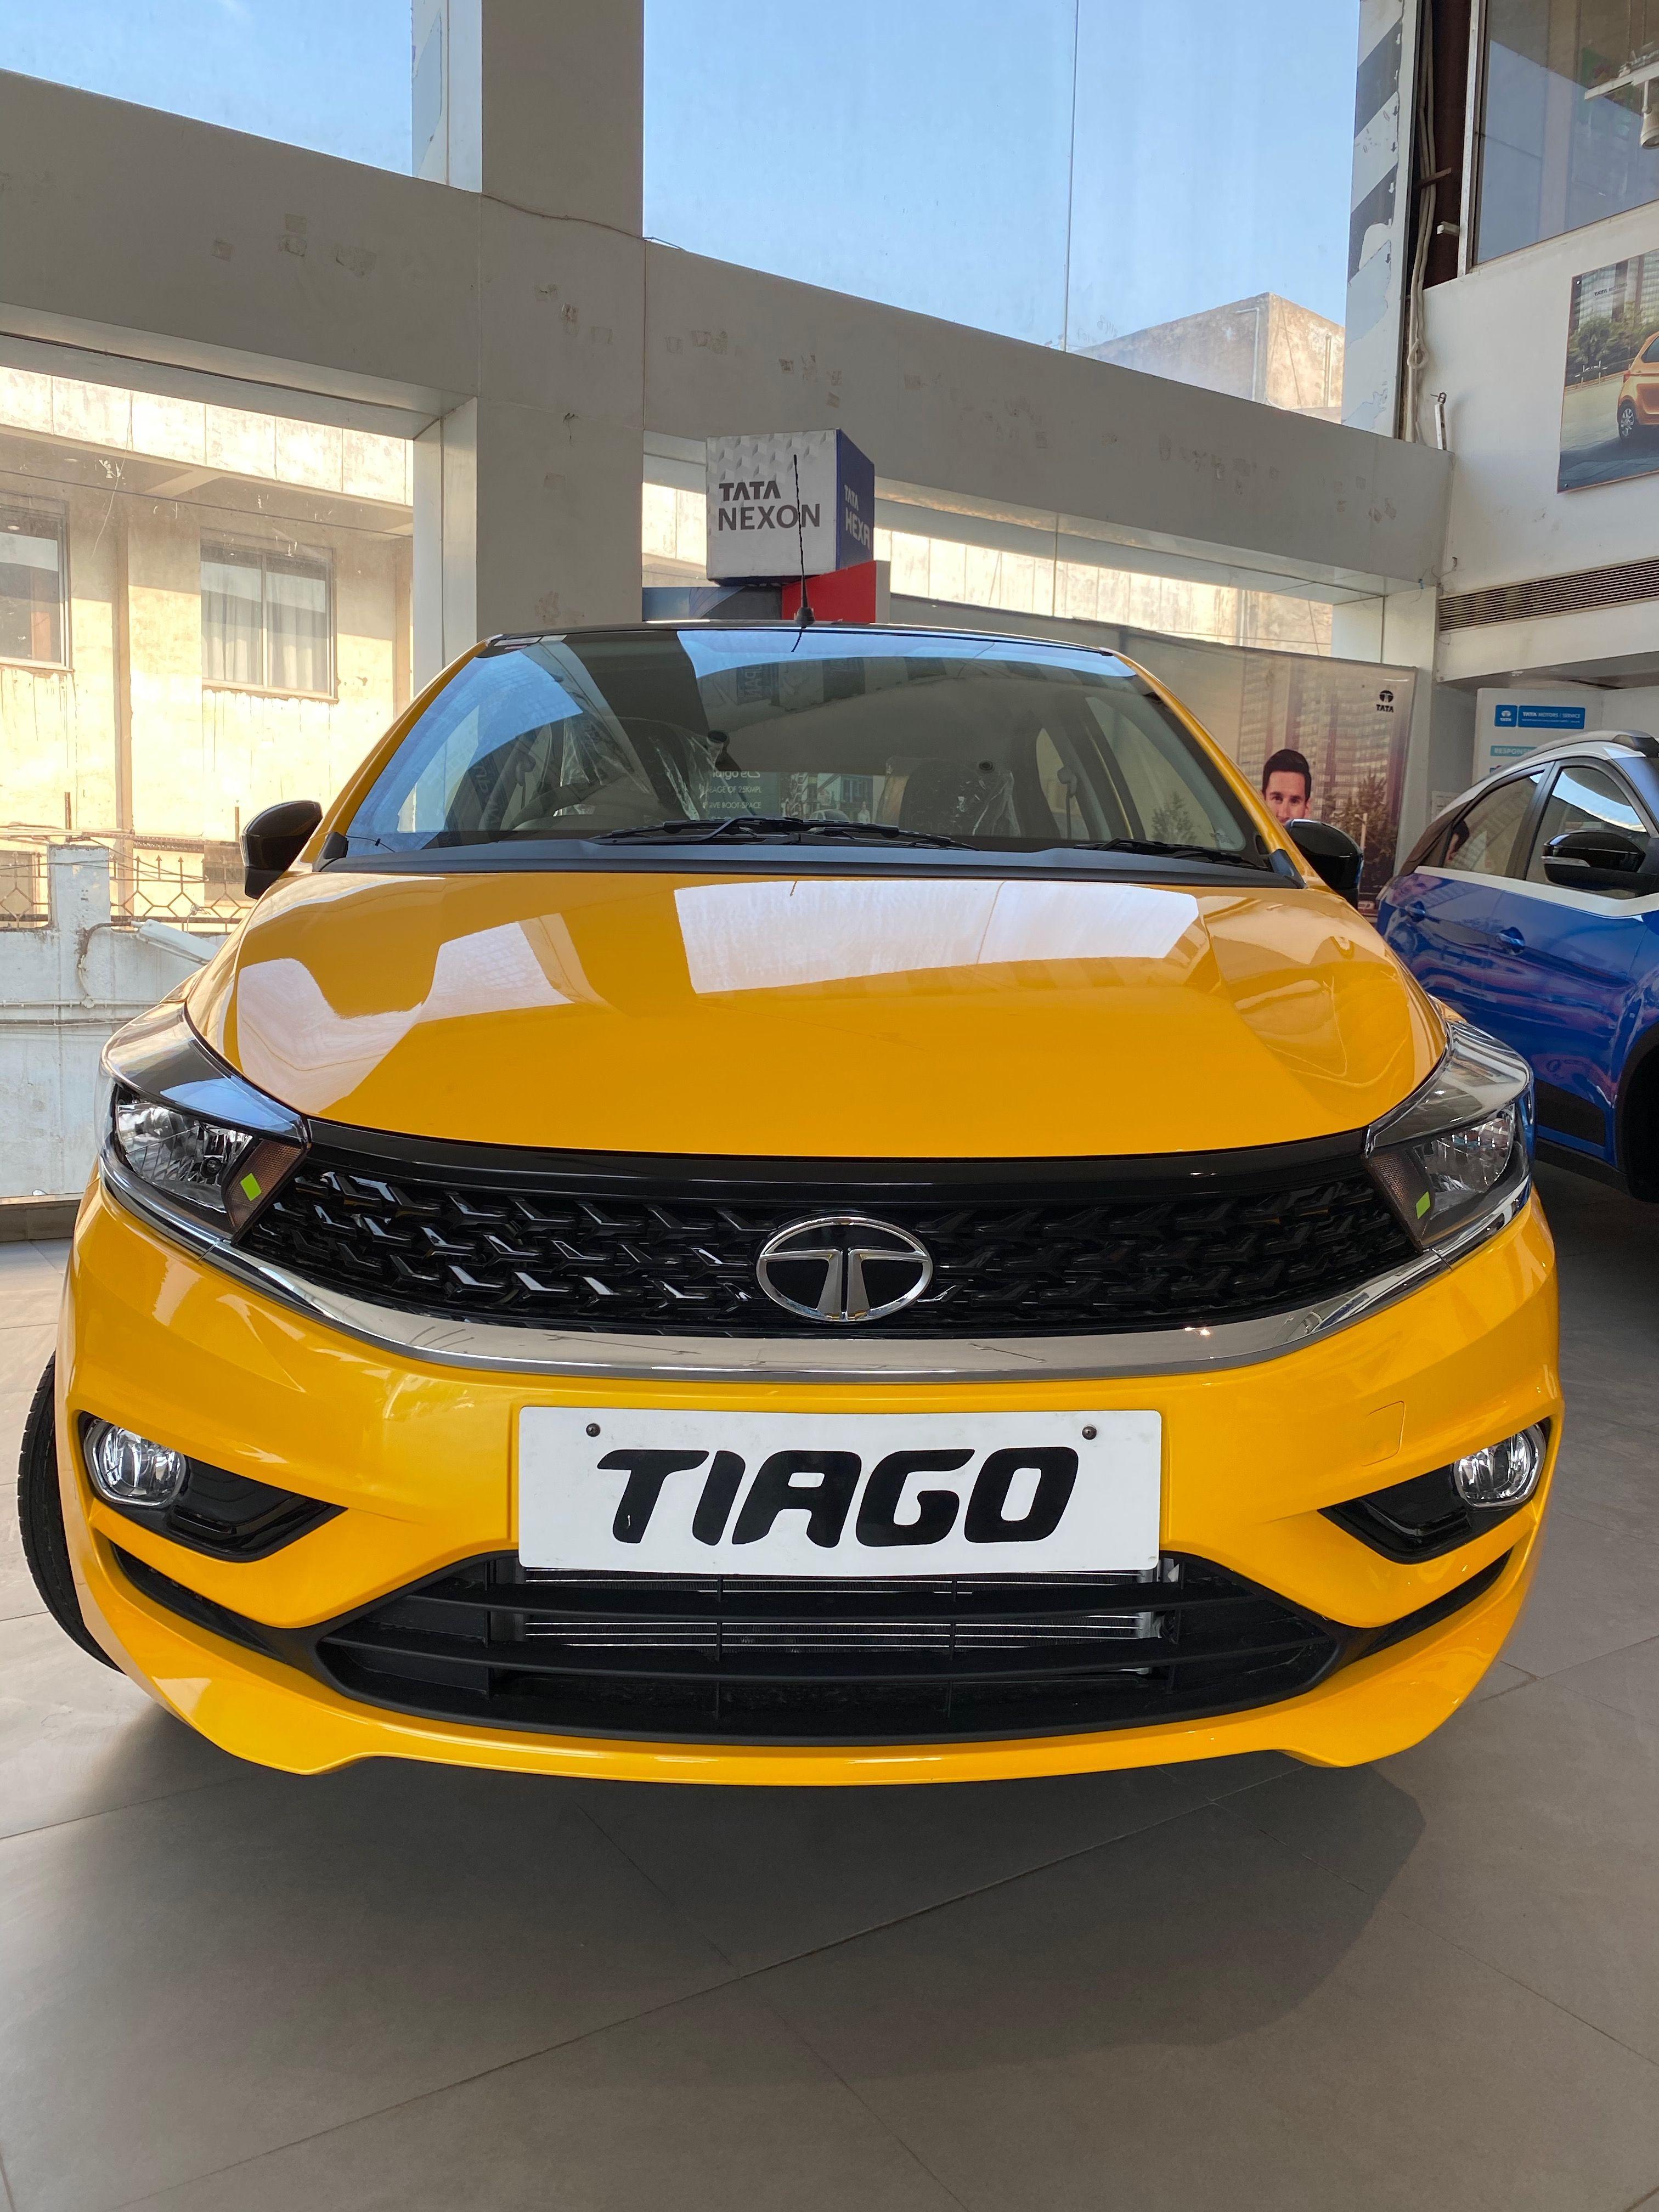 Tatatiago Hatchback Red Yellow Cars Tatamotors Tata Seriouslyfun Tiago Citycar L3 Indian Tatatiagoxz Namastecar Wallpa In 2020 City Car Tata Motors Tata